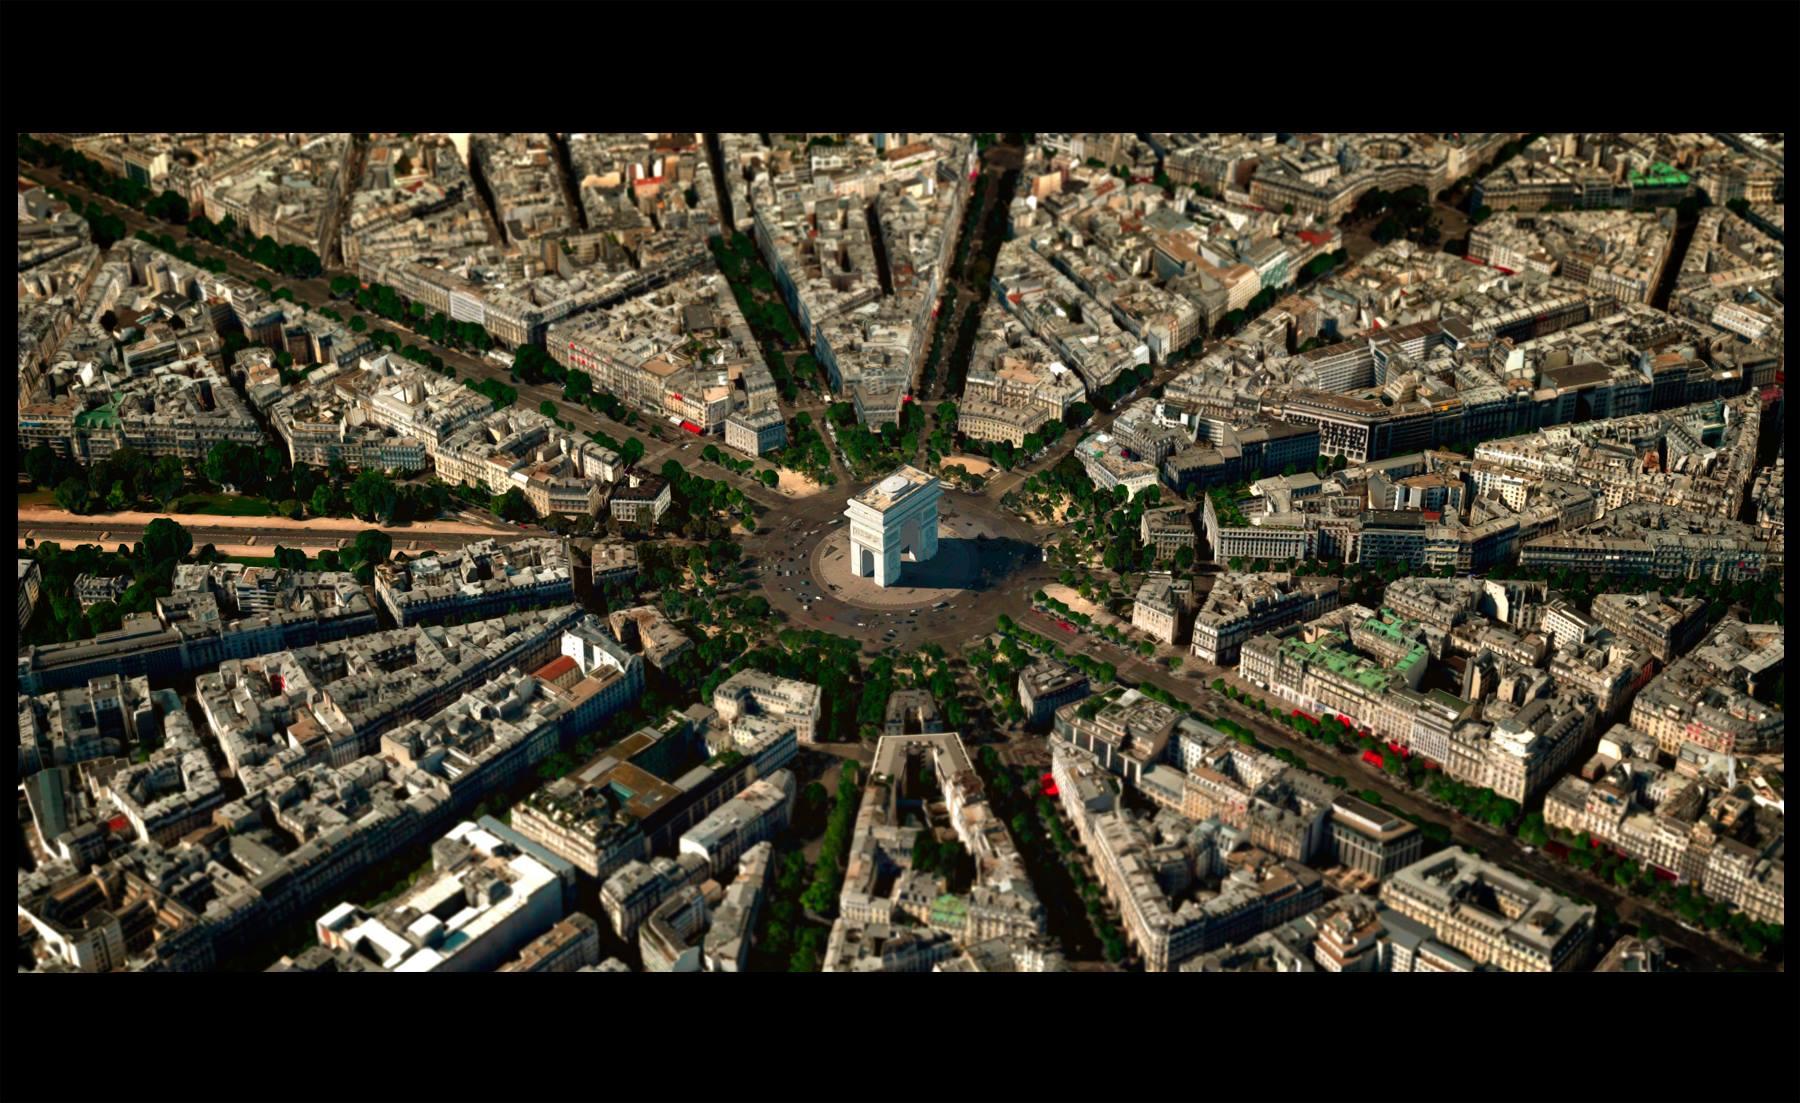 cinemascapes: my street view edition - Paris